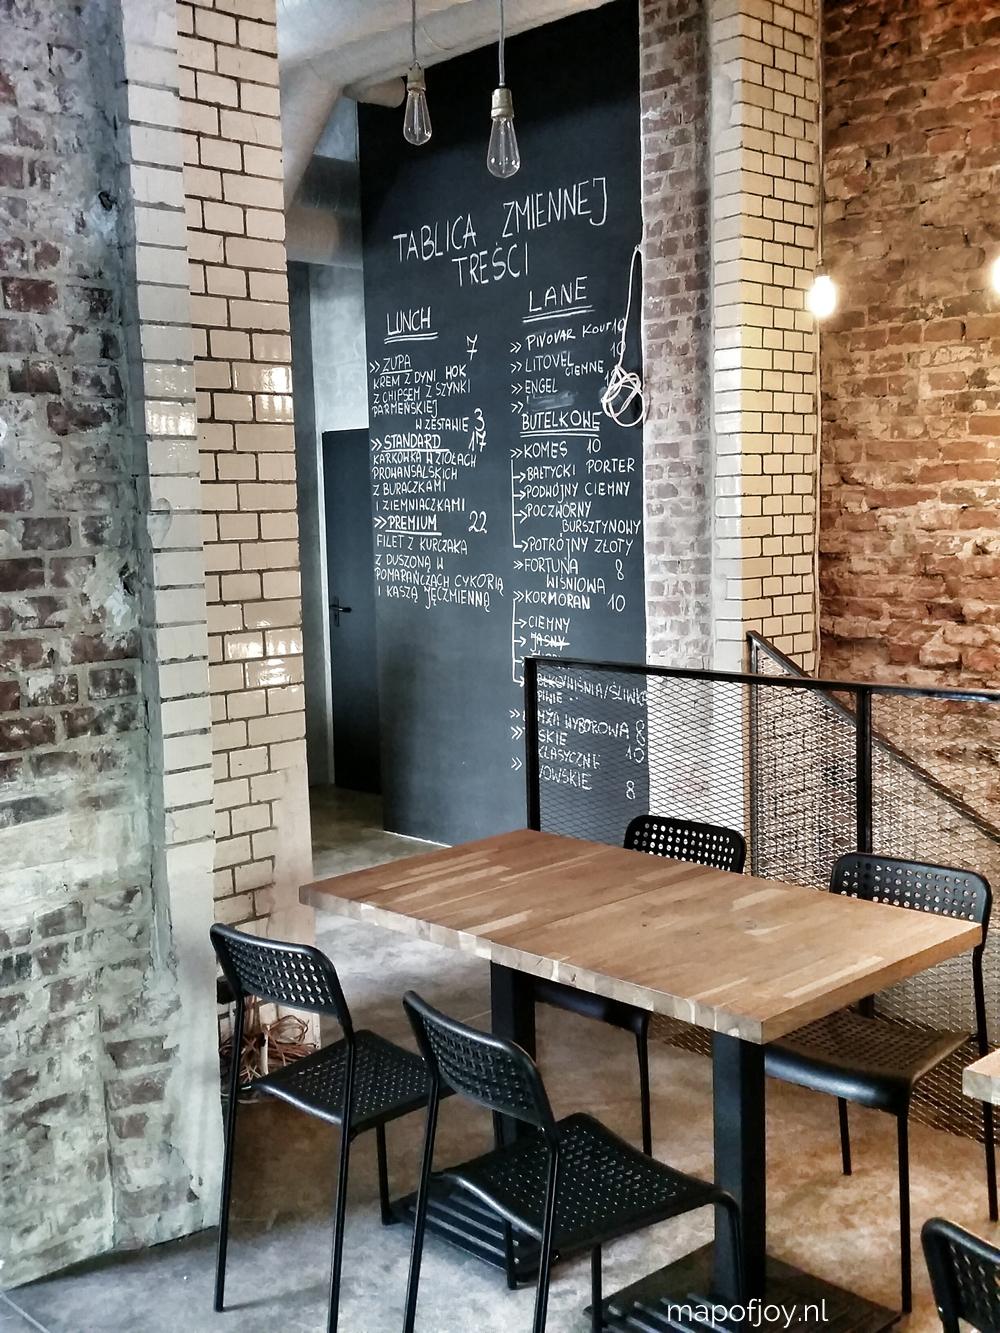 8x food hotspot Parish Pub in Wroclaw, Poland - Map of Joy